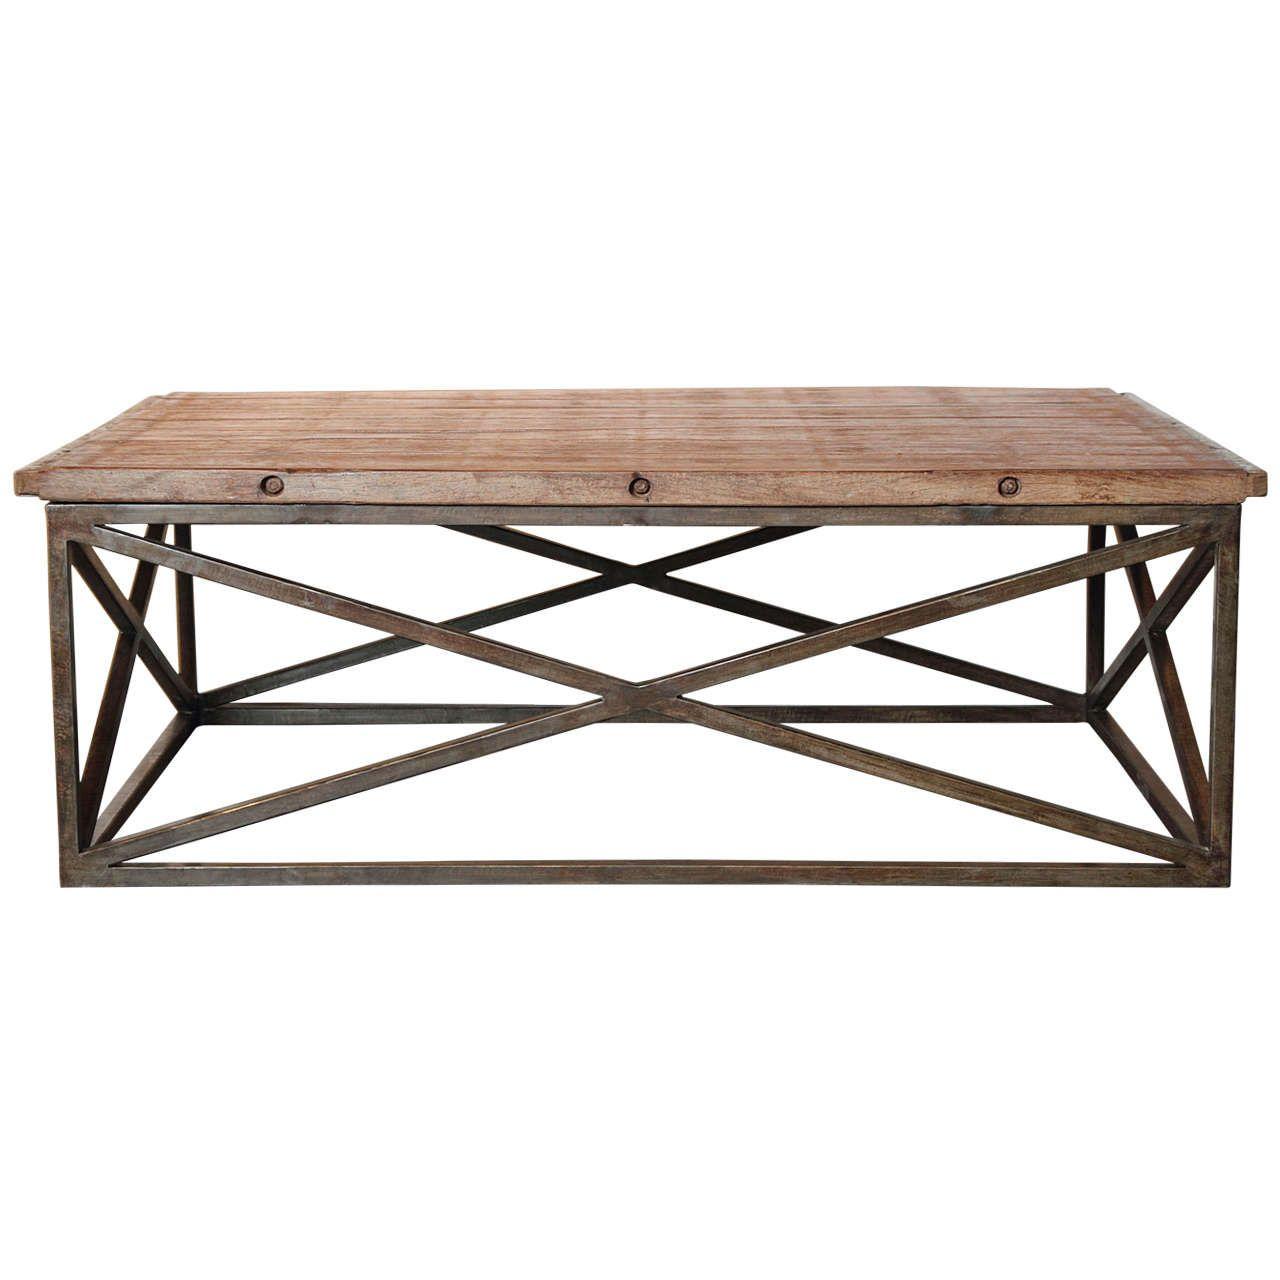 Dutch Brick Baker S Coffee Table In Indonesian Teak Coffee Table Table Furniture [ 1280 x 1280 Pixel ]